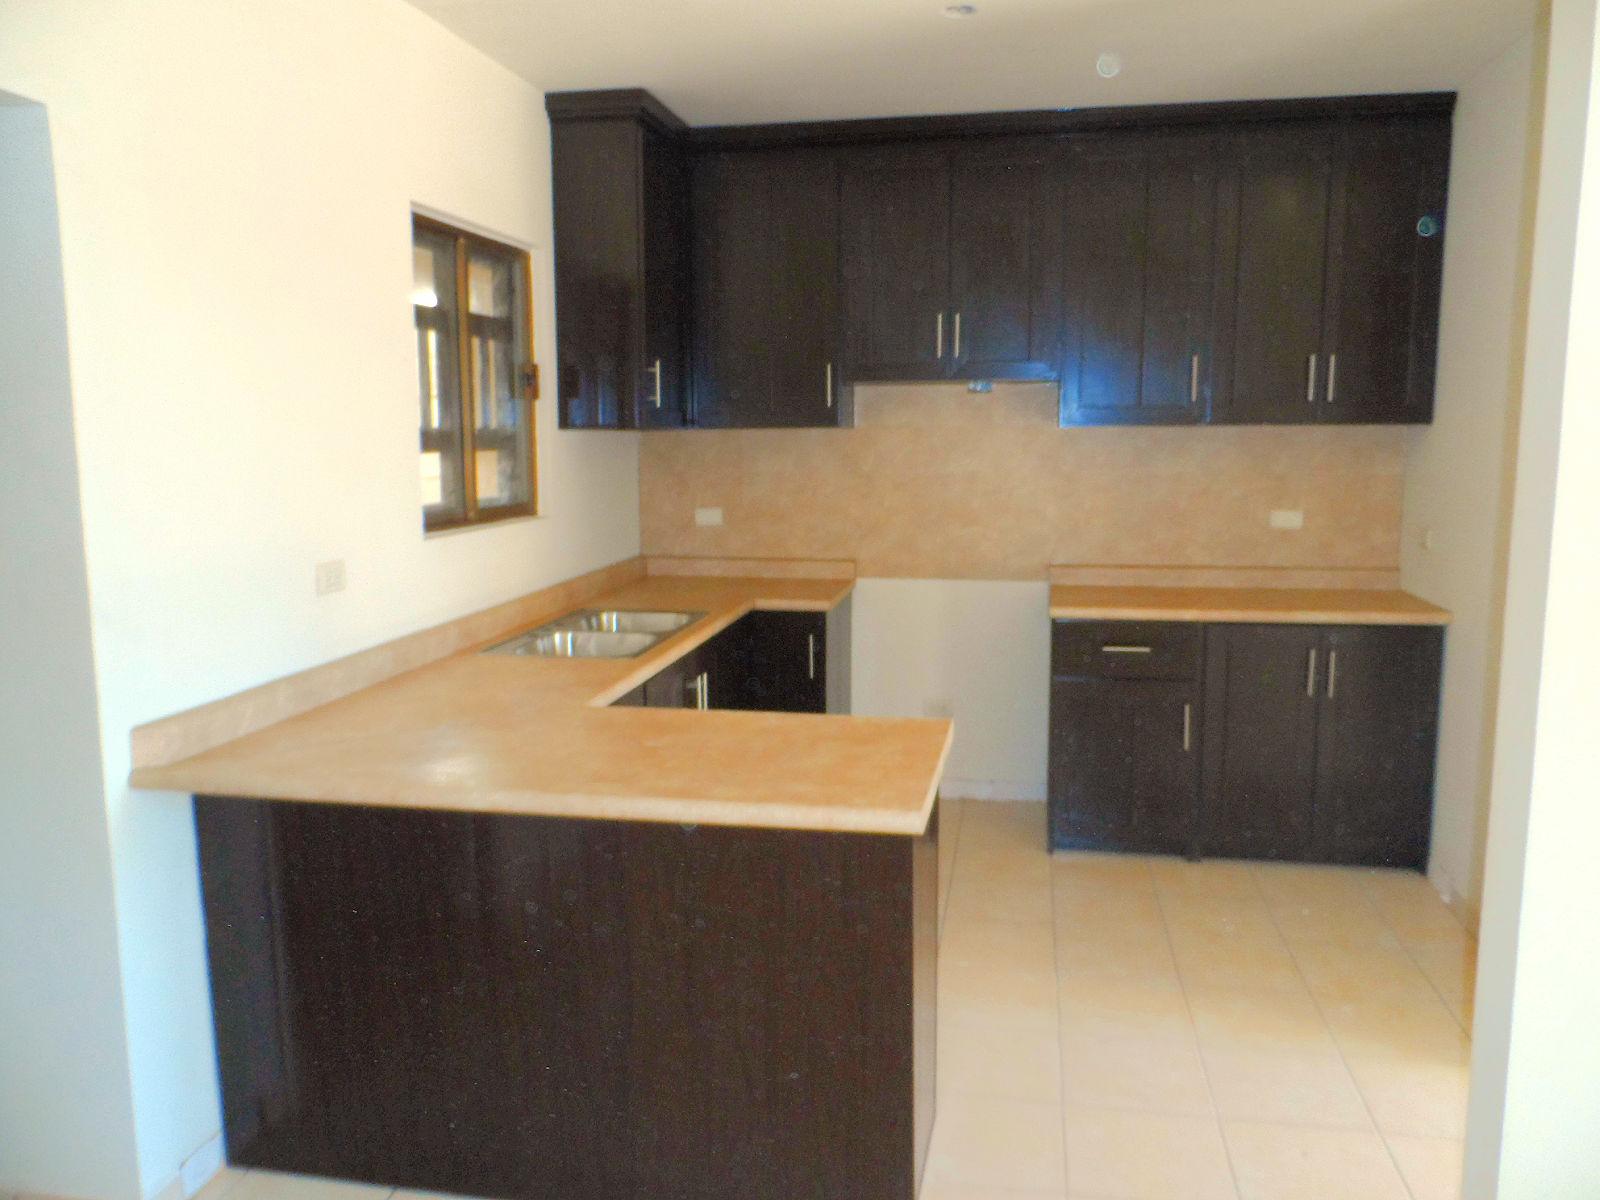 Sam 2472 2 for Cocinas de concreto forradas de azulejo